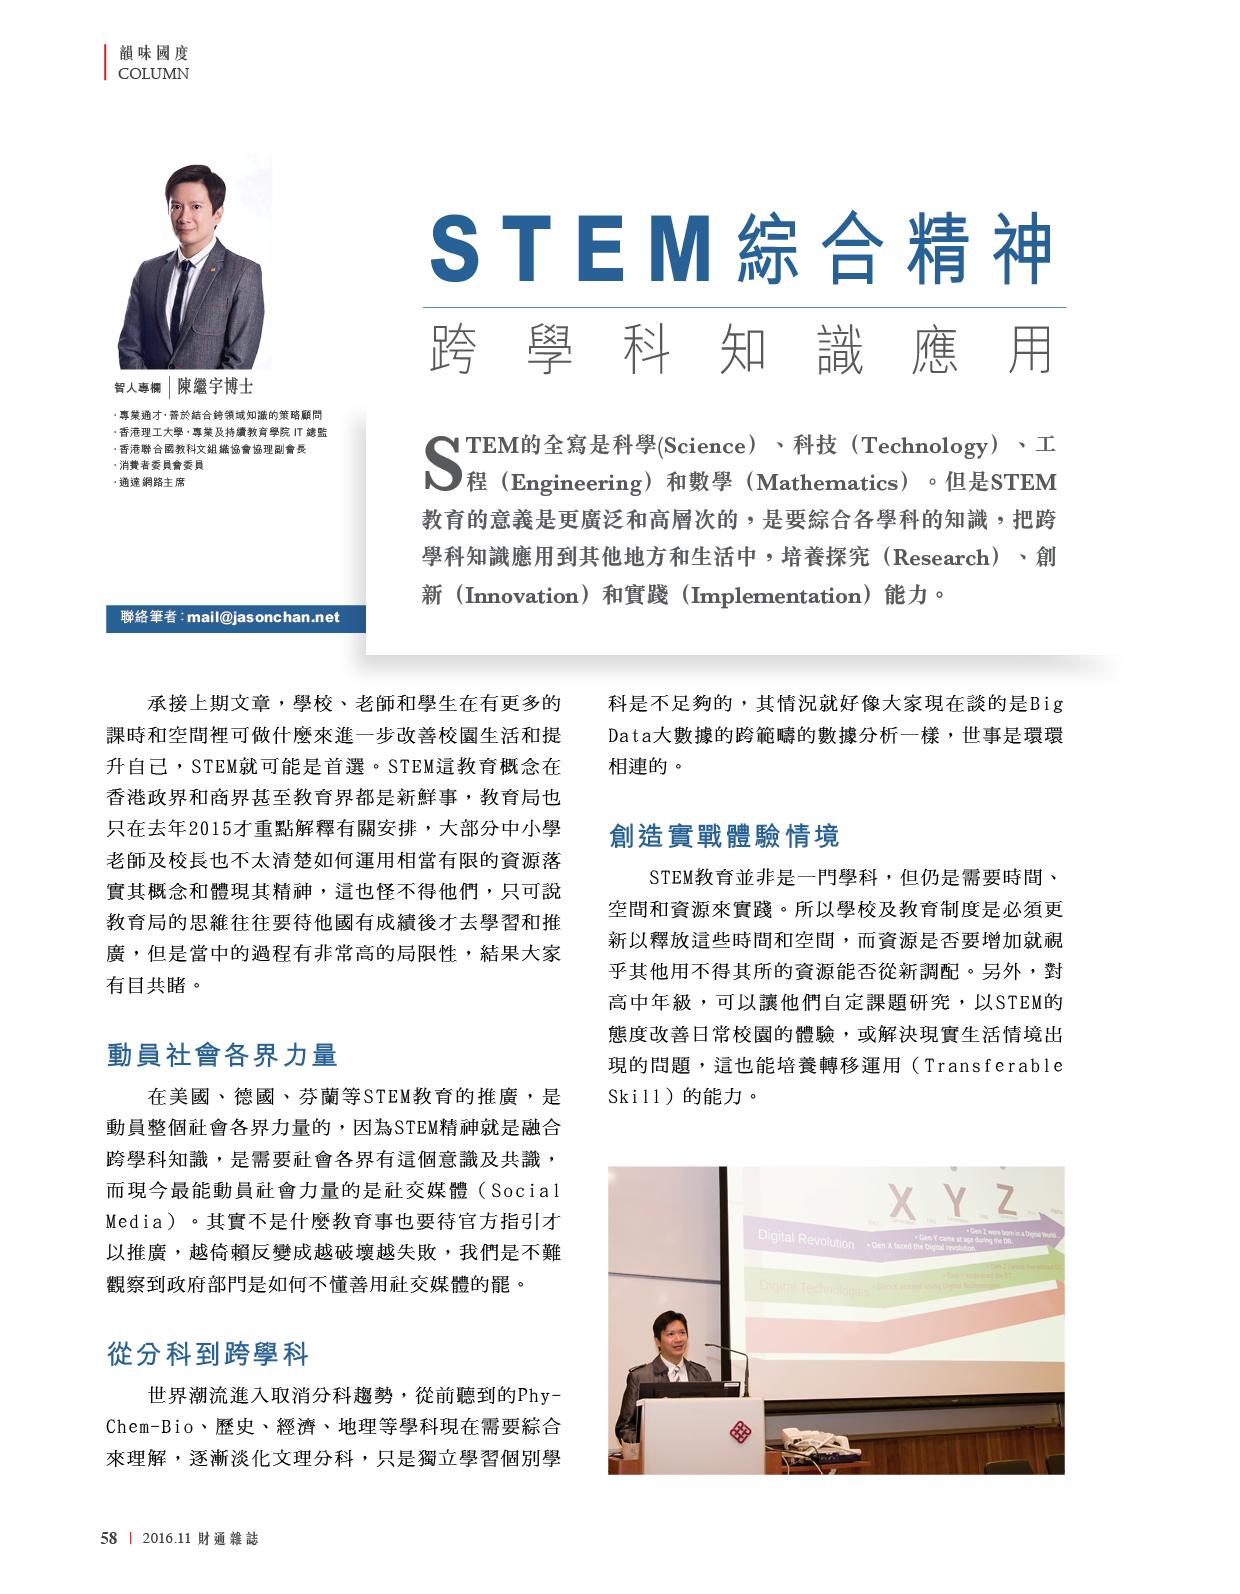 STEM綜合精神 跨學科知識應用